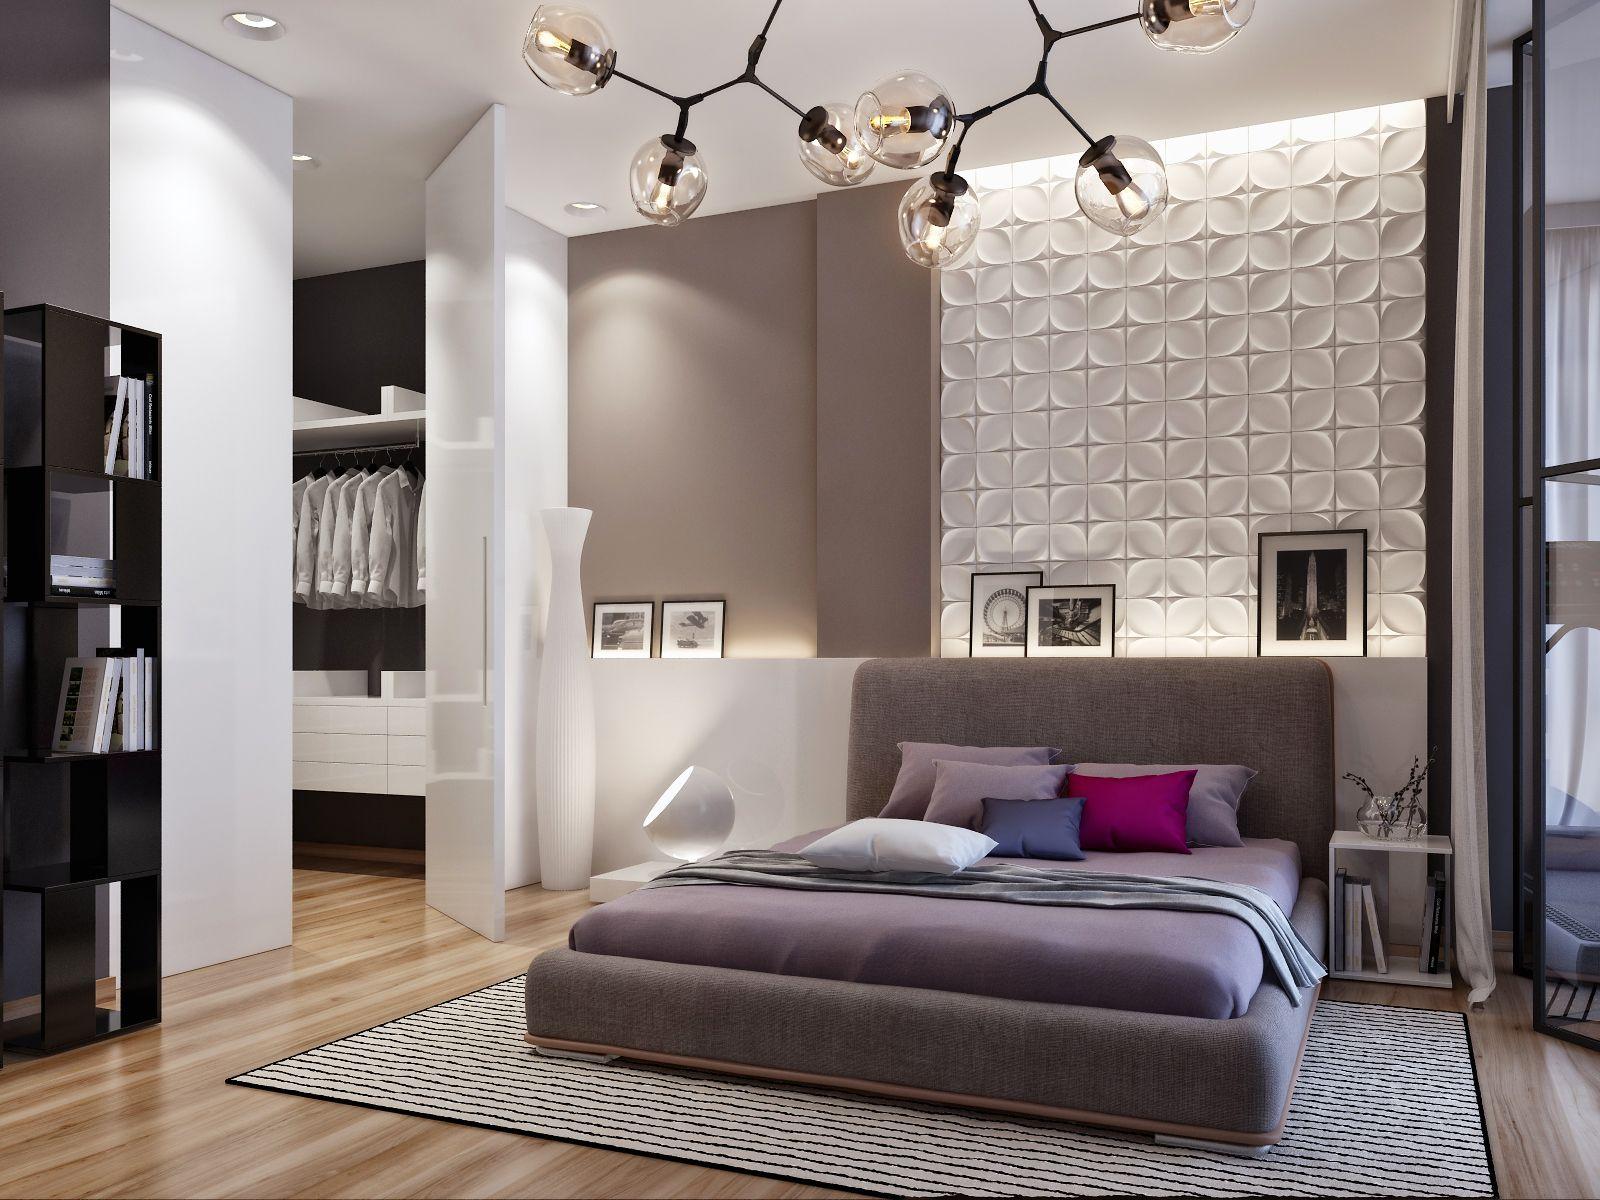 Modern Bedroom Design From A Home In Ukraine Luxurious Bedrooms Master Bedroom Interior Design Cool Lights For Bedroom